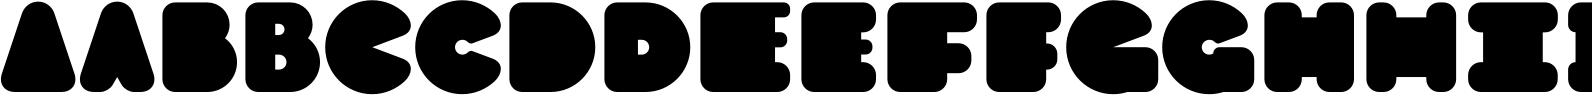 Varese Soft